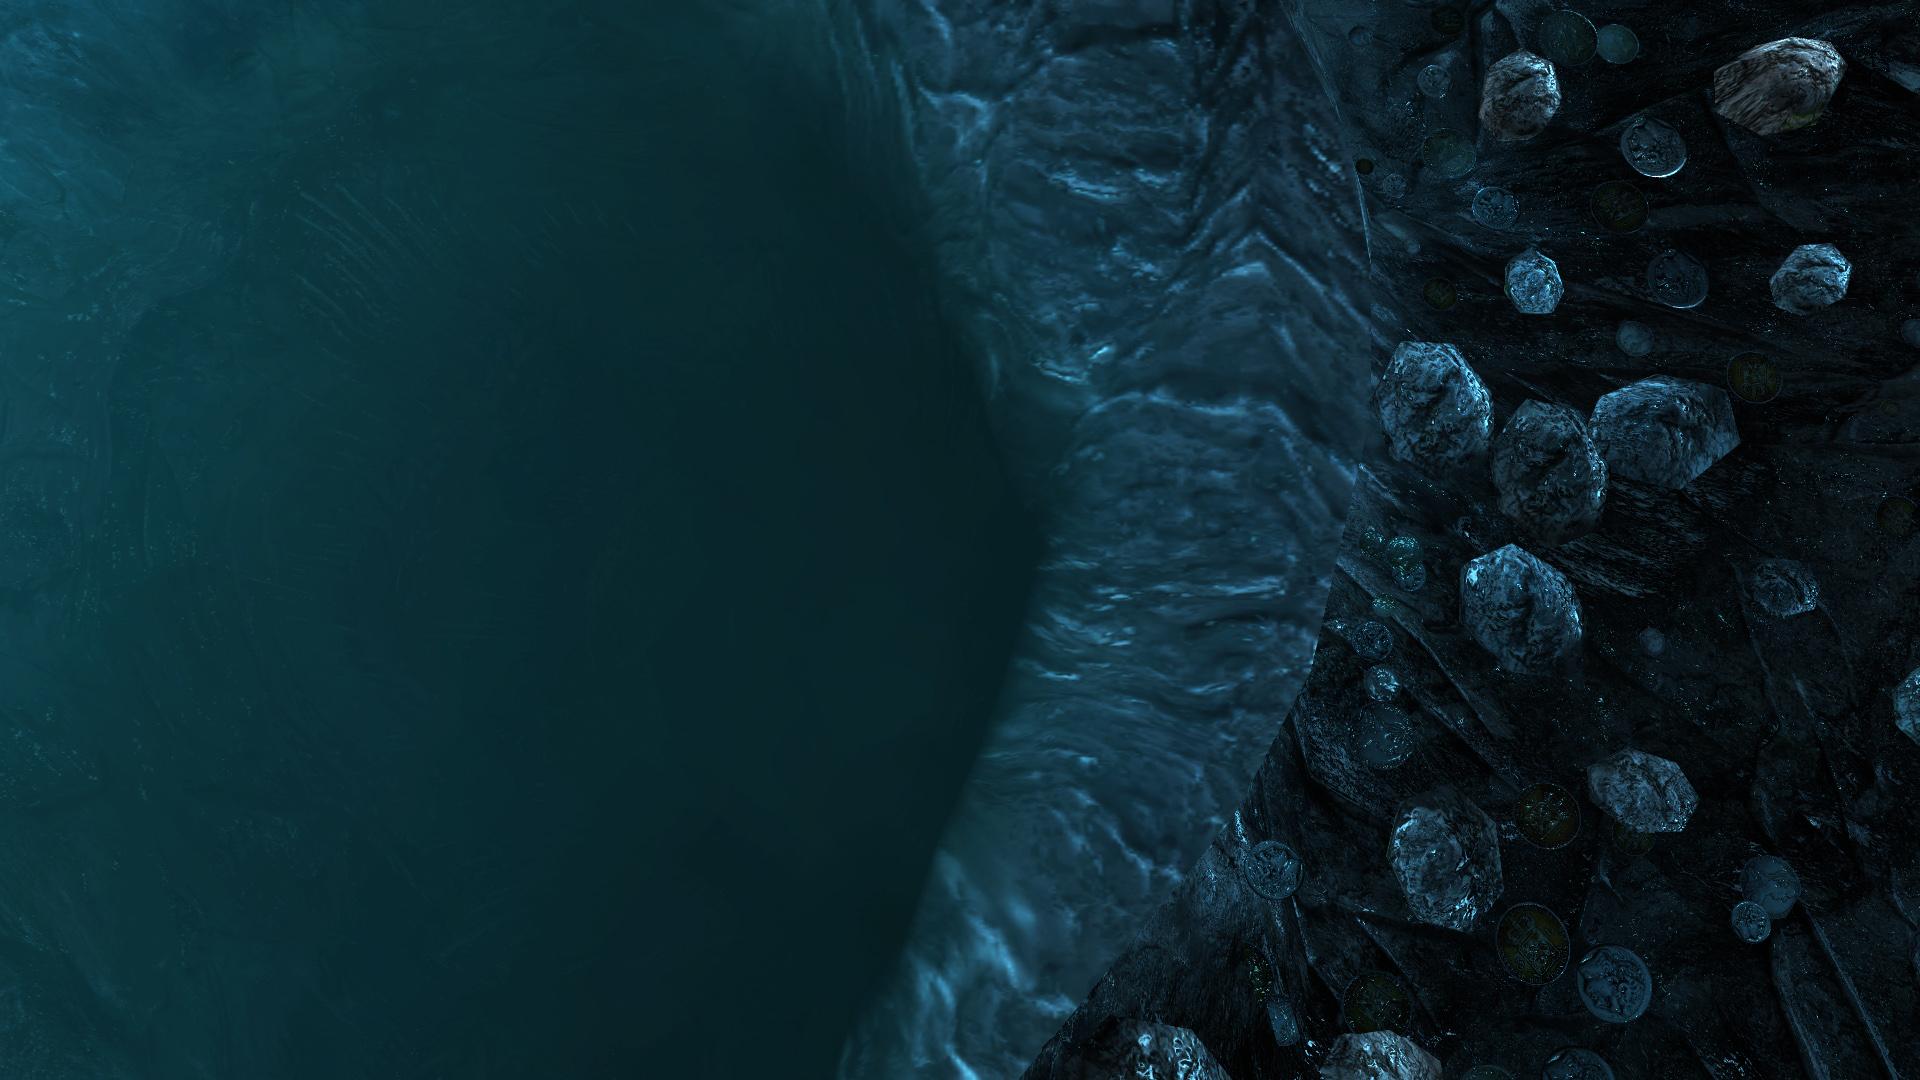 deepdrop